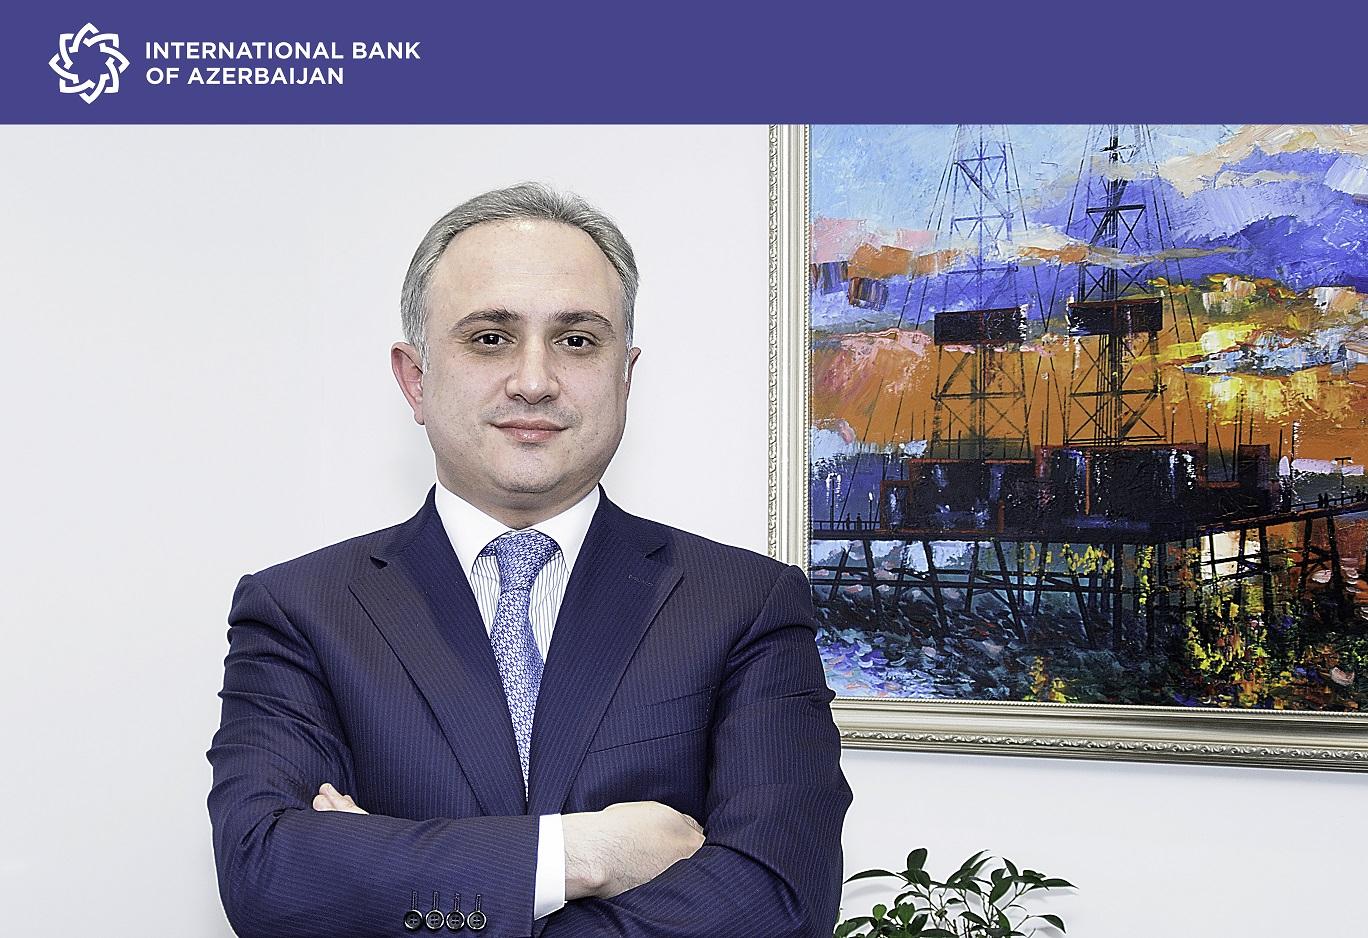 International Bank of Azerbaijan Introduces a Unique Financial Services Concept